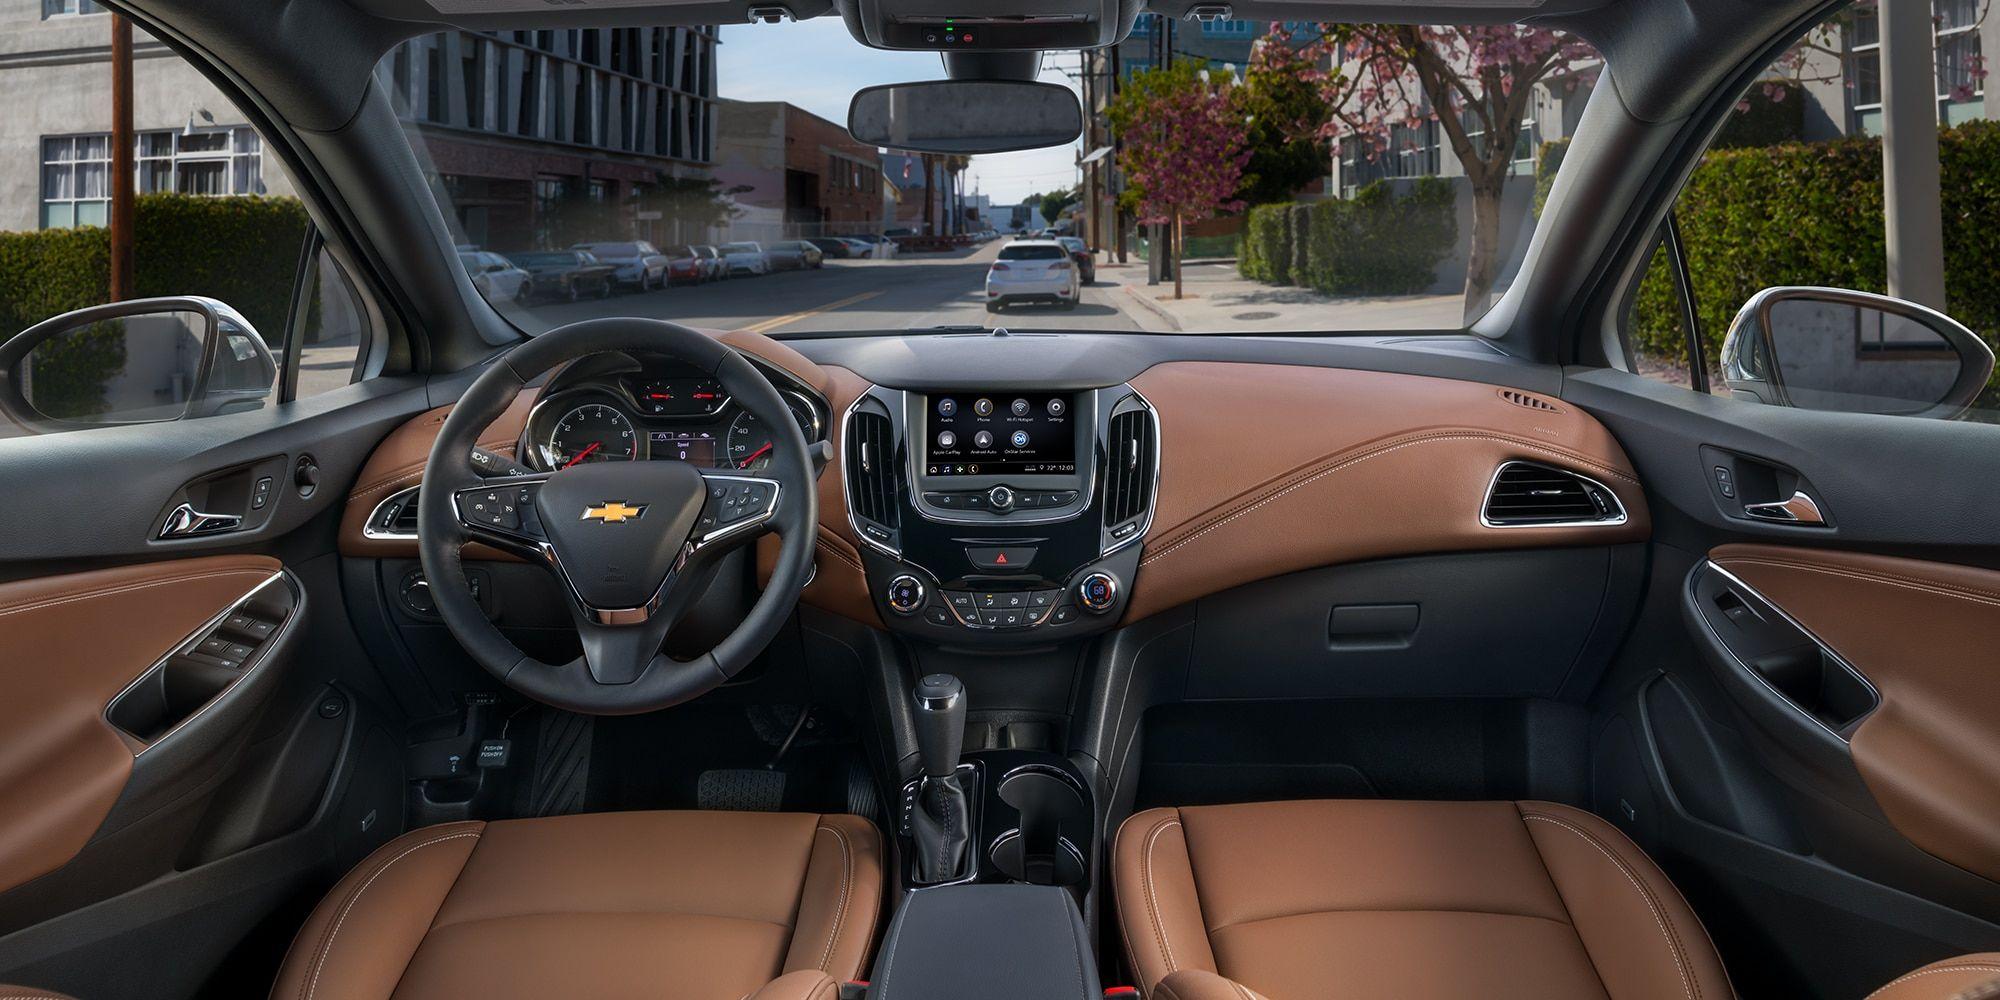 Pin On 2019 Chevrolet Cruze